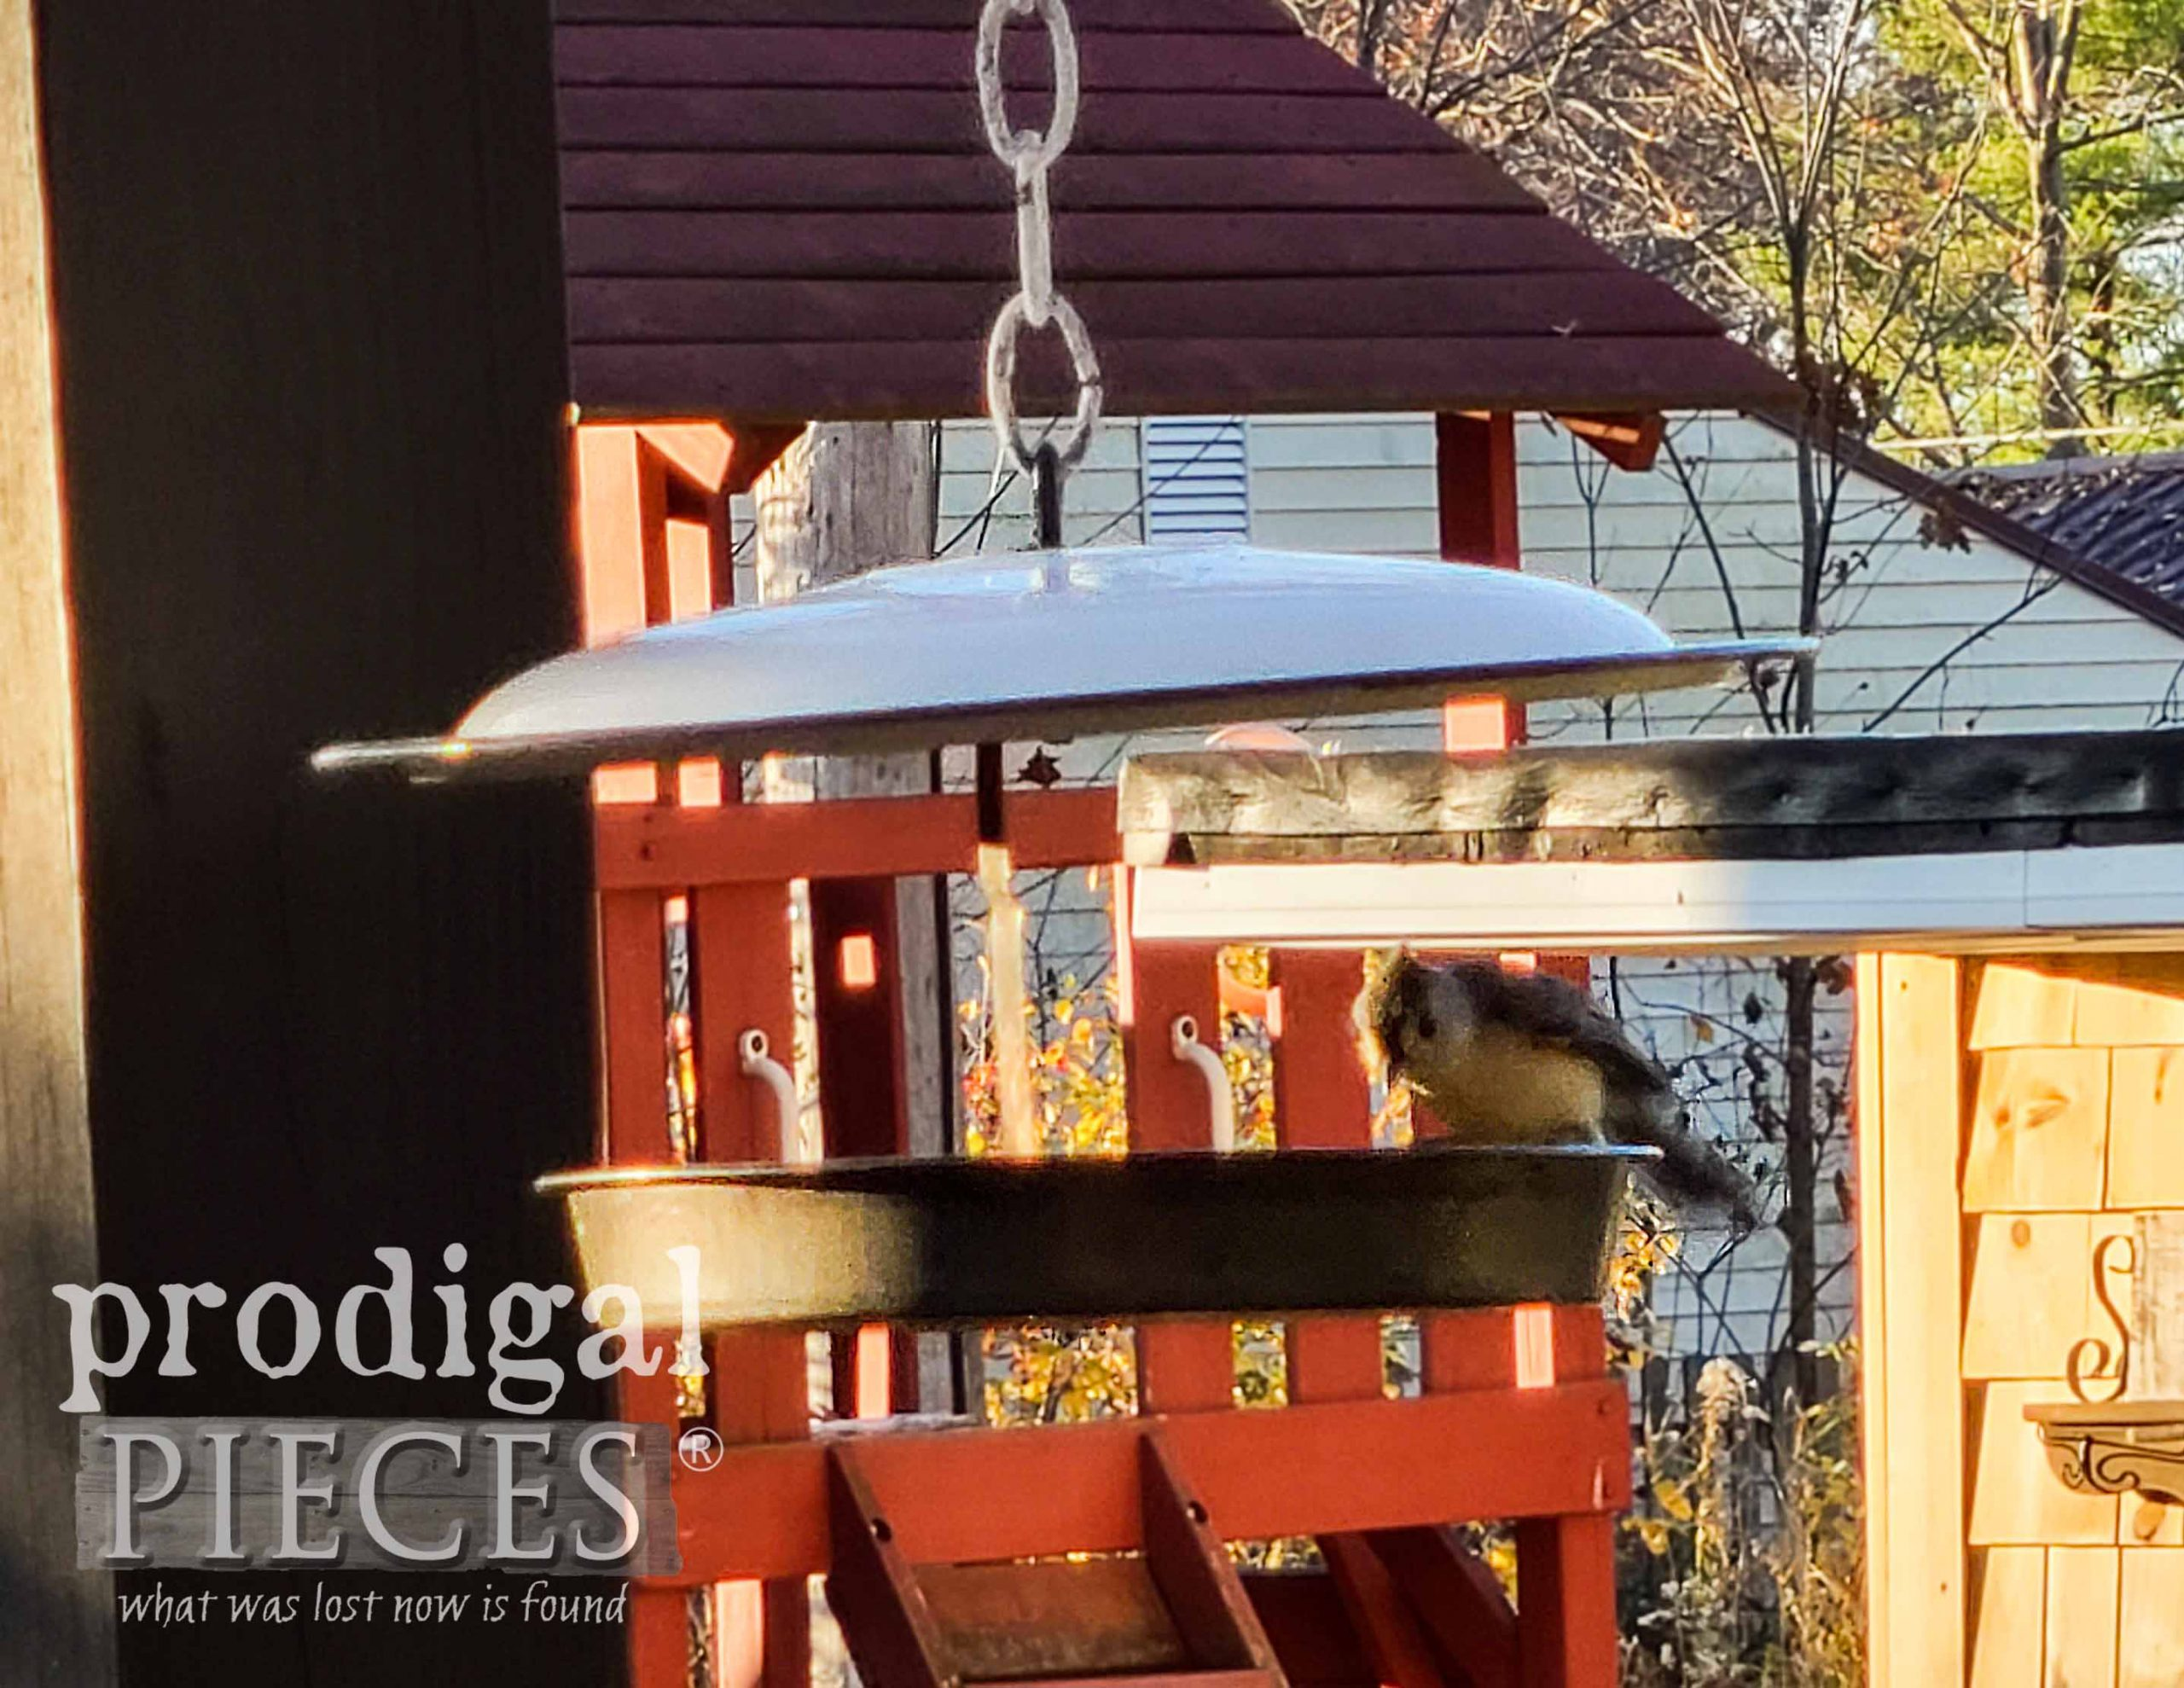 Upcycled Bird Feeder with Nuthatch by Larissa of Prodigal Pieces | prodigalpieces.com #prodigalpieces #garden #farmhouse #birds